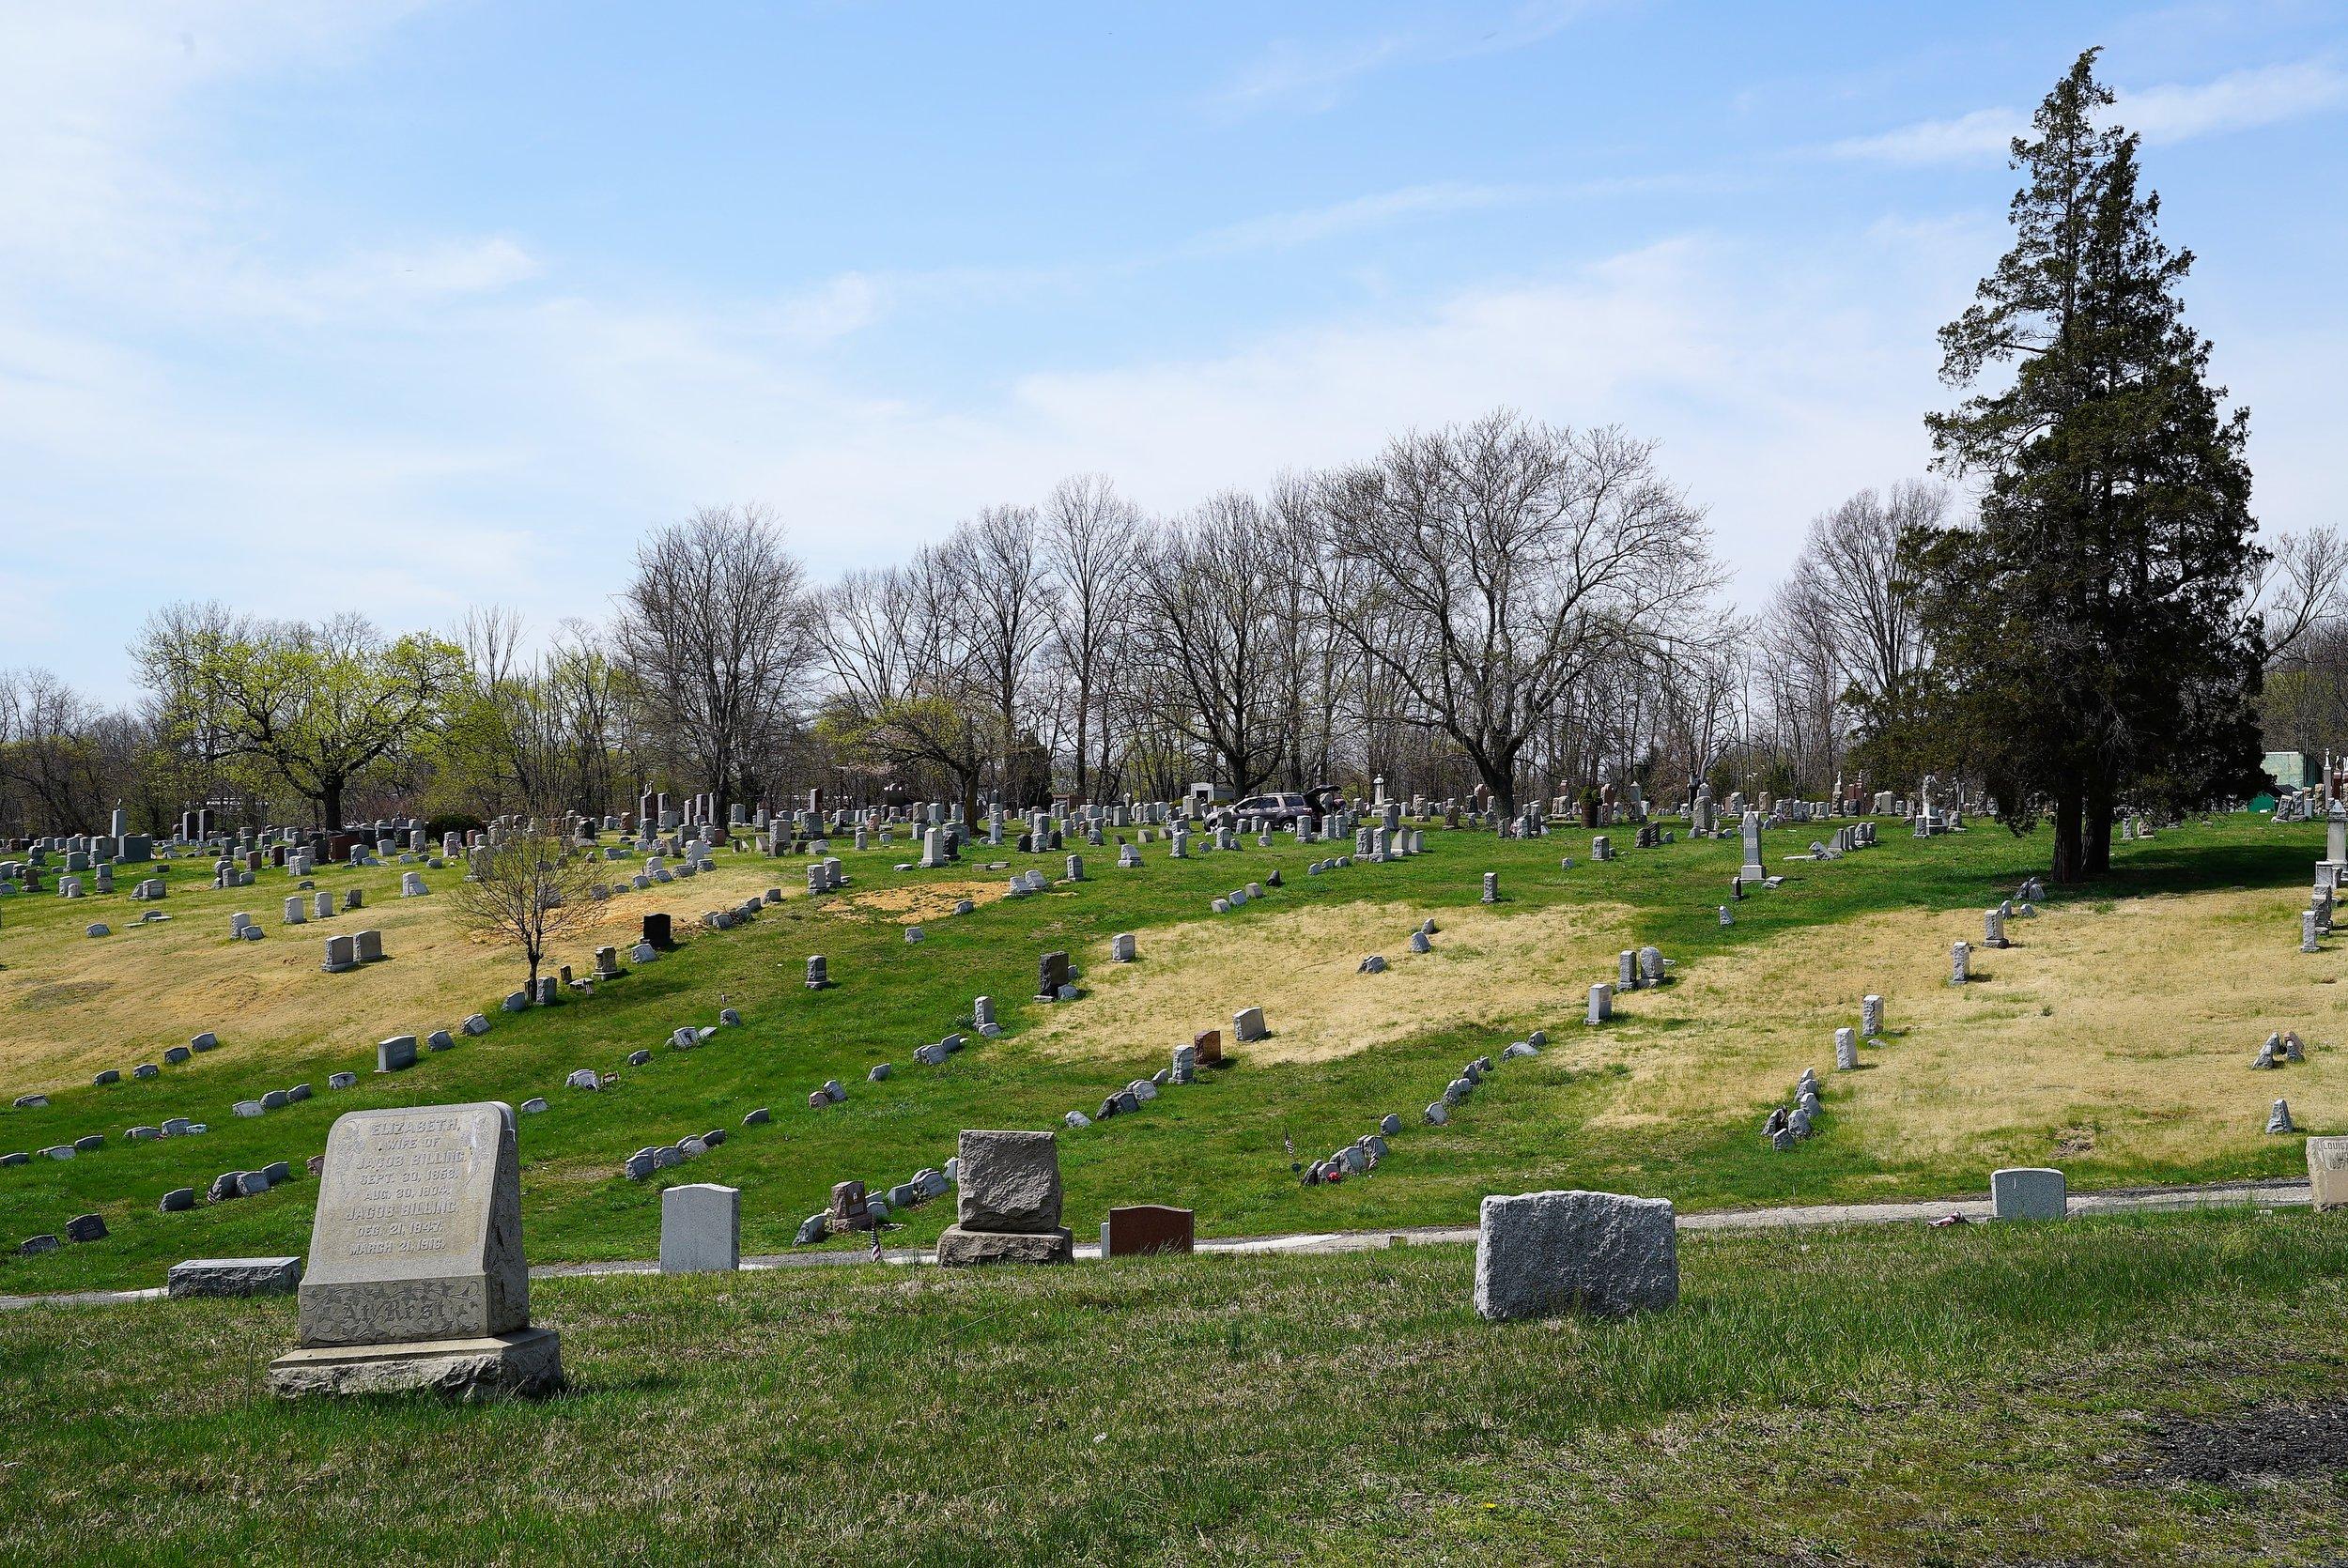 Above: Mount Zion Cemetery. Collingdale, PA. April 11, 2017